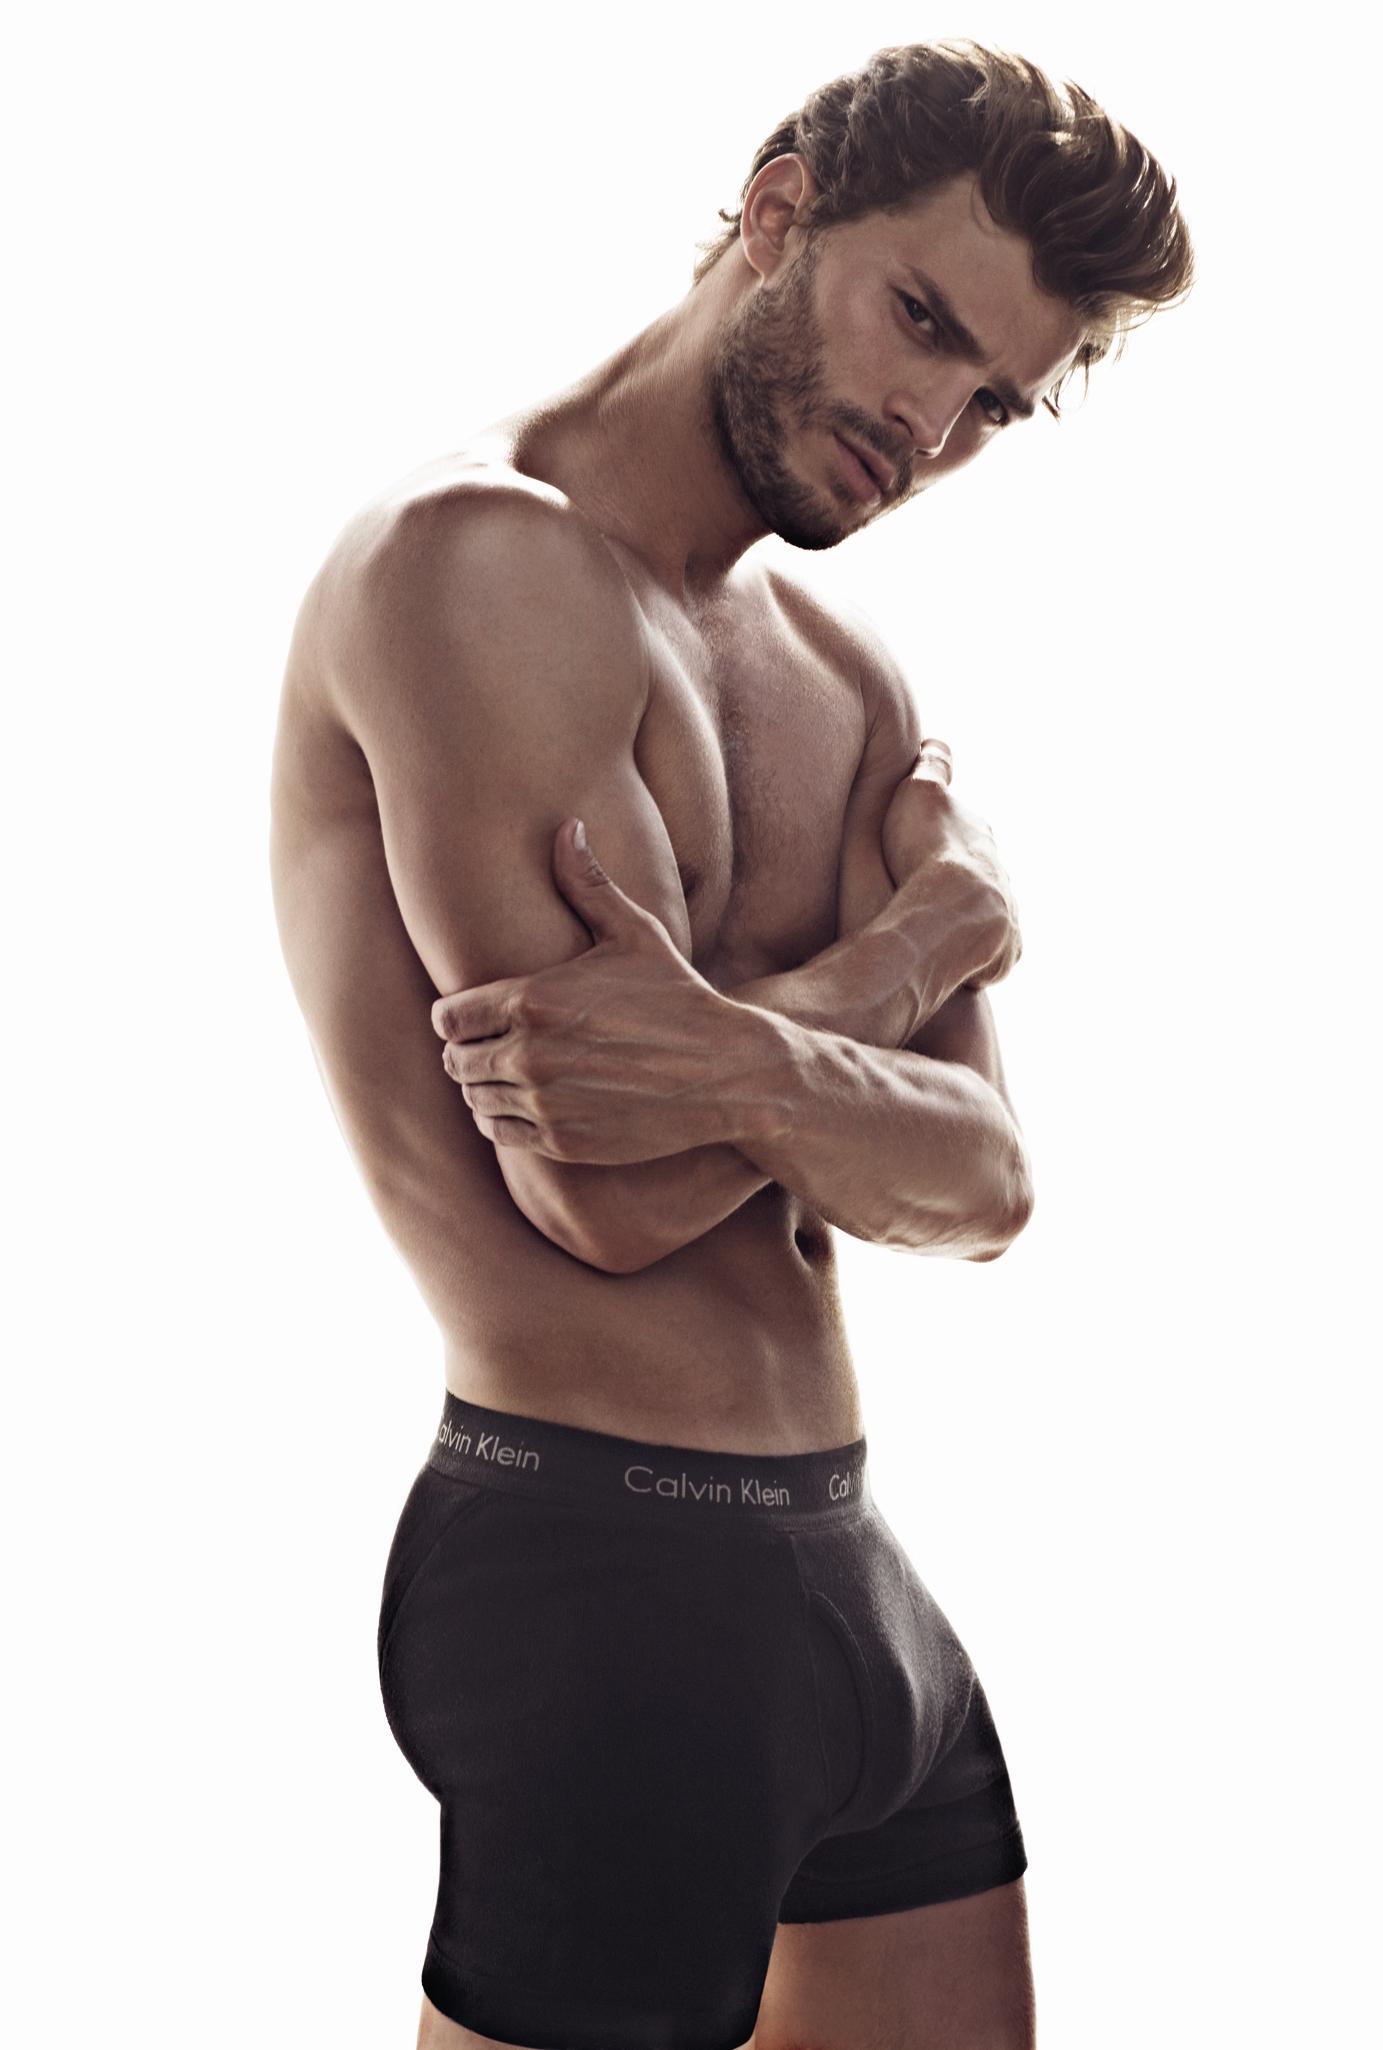 Jamie-Dornan-naked-nude-model-actor-8